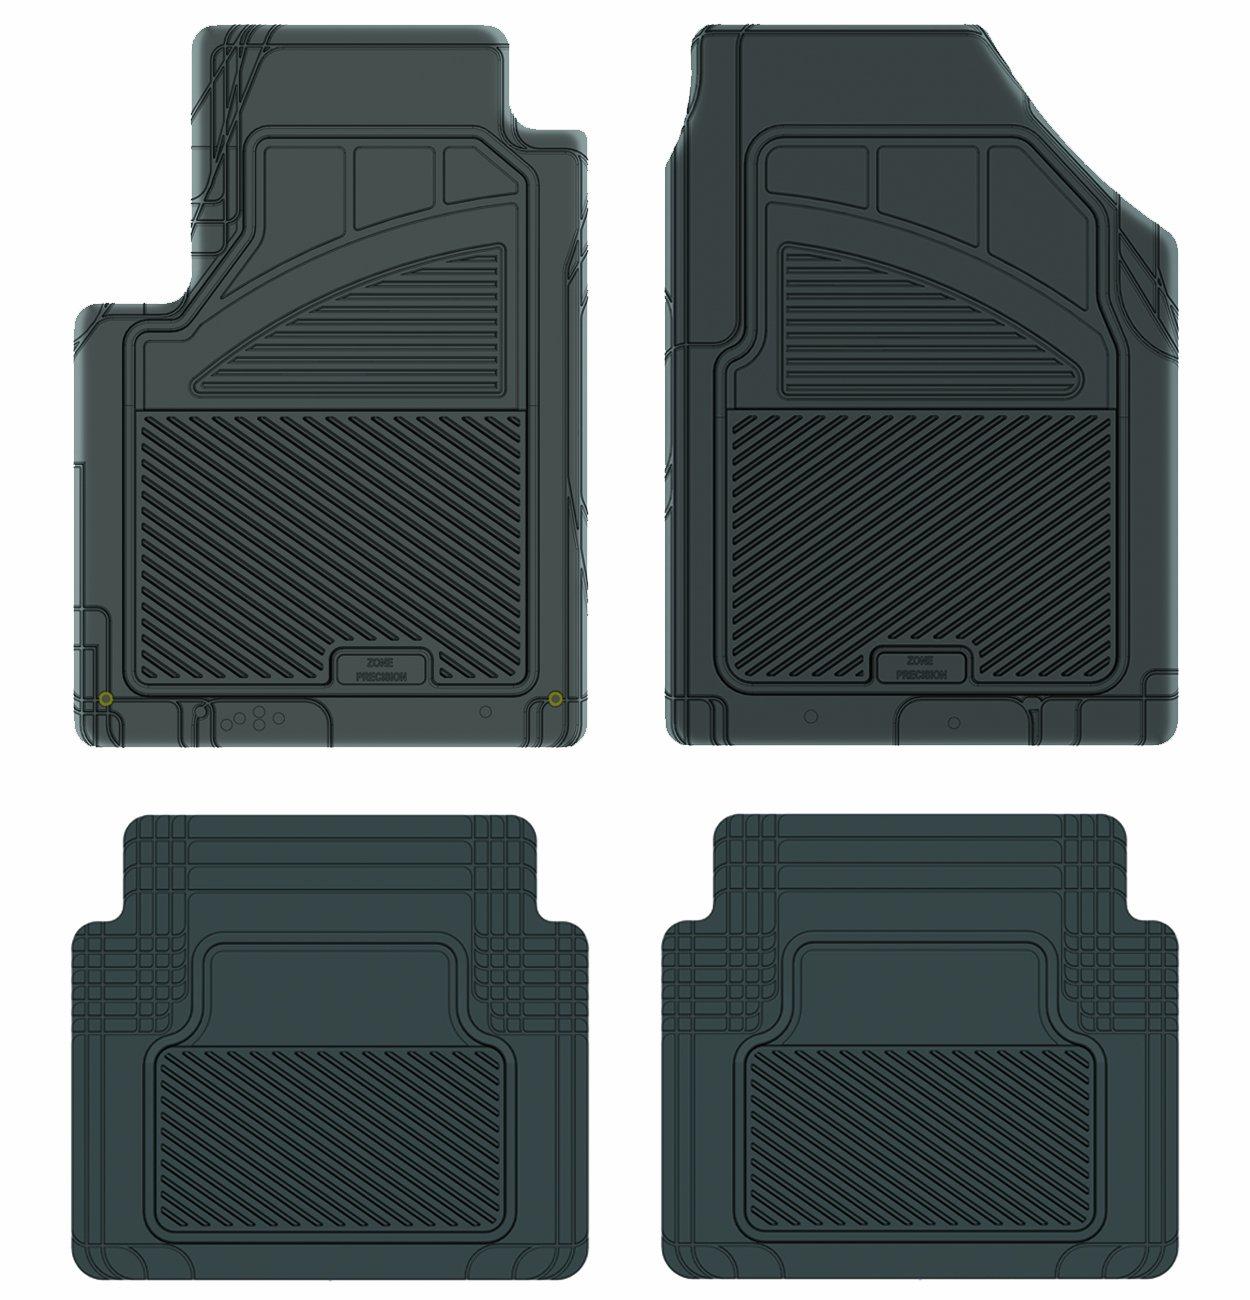 Grey Koolatron Pants Saver Custom Fit 4 Piece All Weather Car Mat for Select Nissan Murano Models